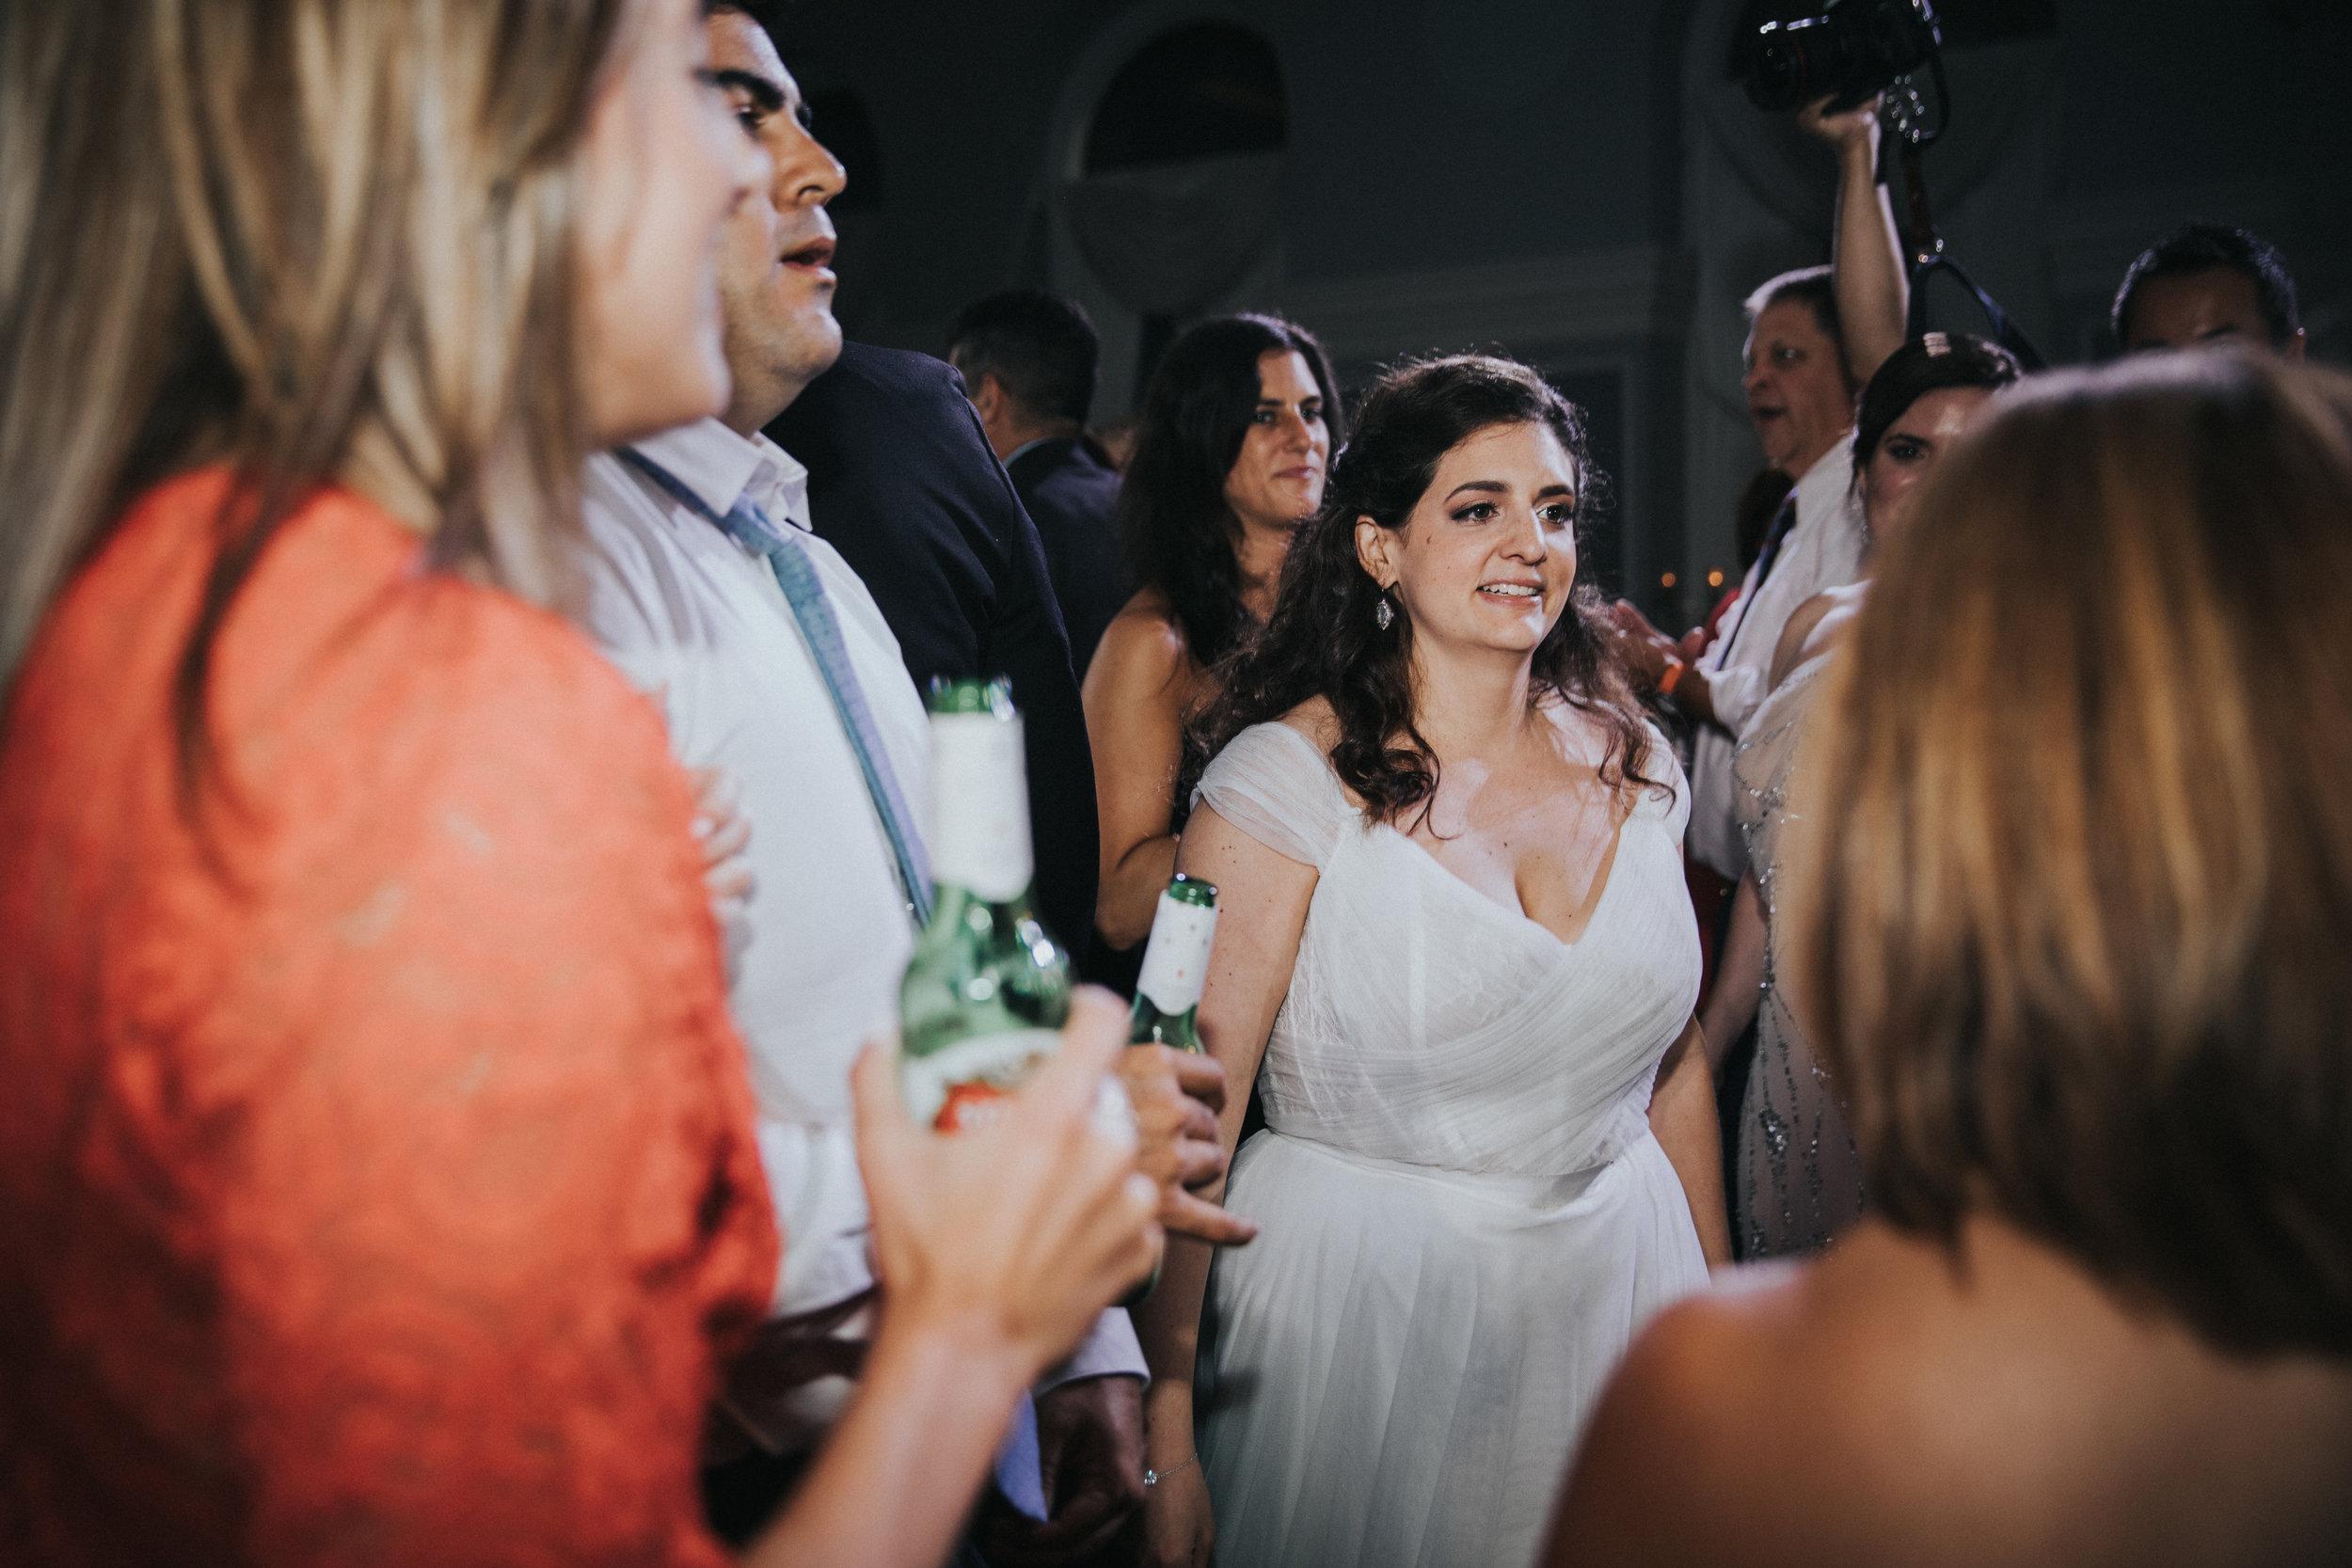 JennaLynnPhotography-NJWeddingPhotographer-Philadelphia-Wedding-ArtsBallroom-Reception-100.jpg